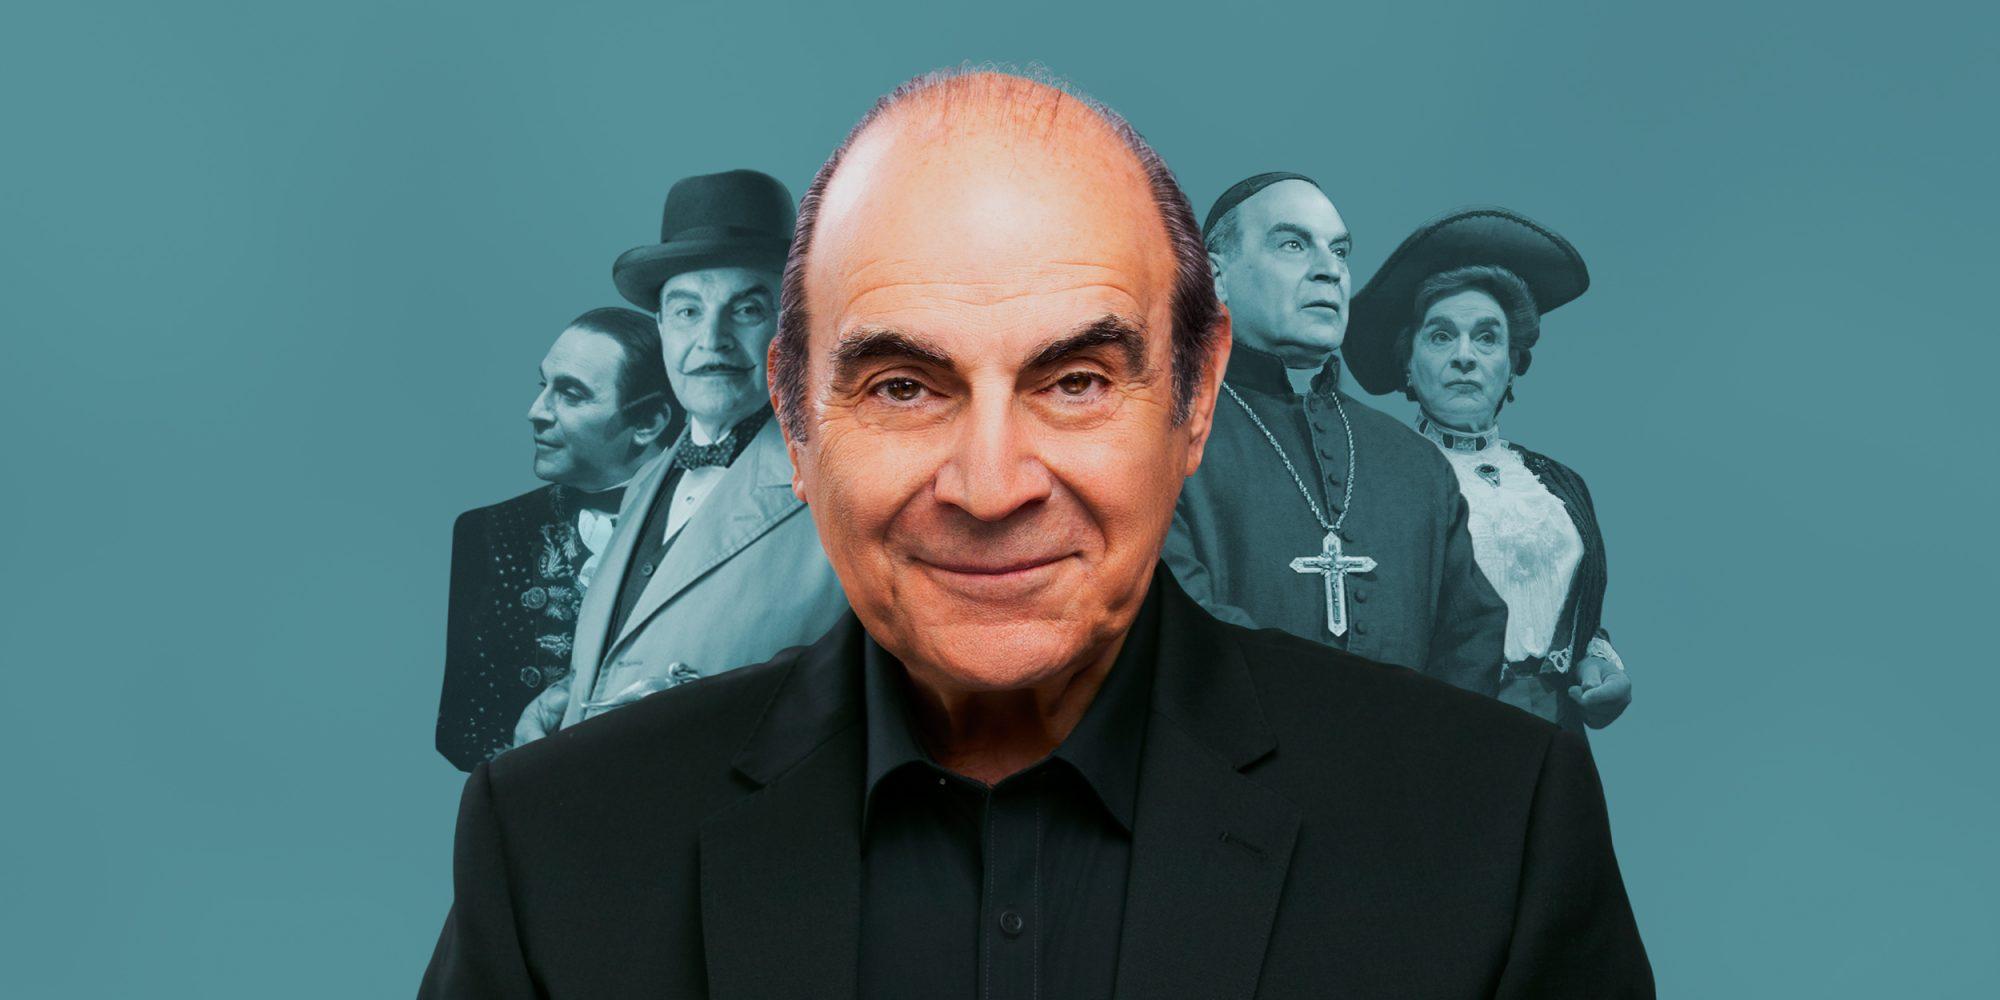 David Suchet: Poirot And More: A Retrospective